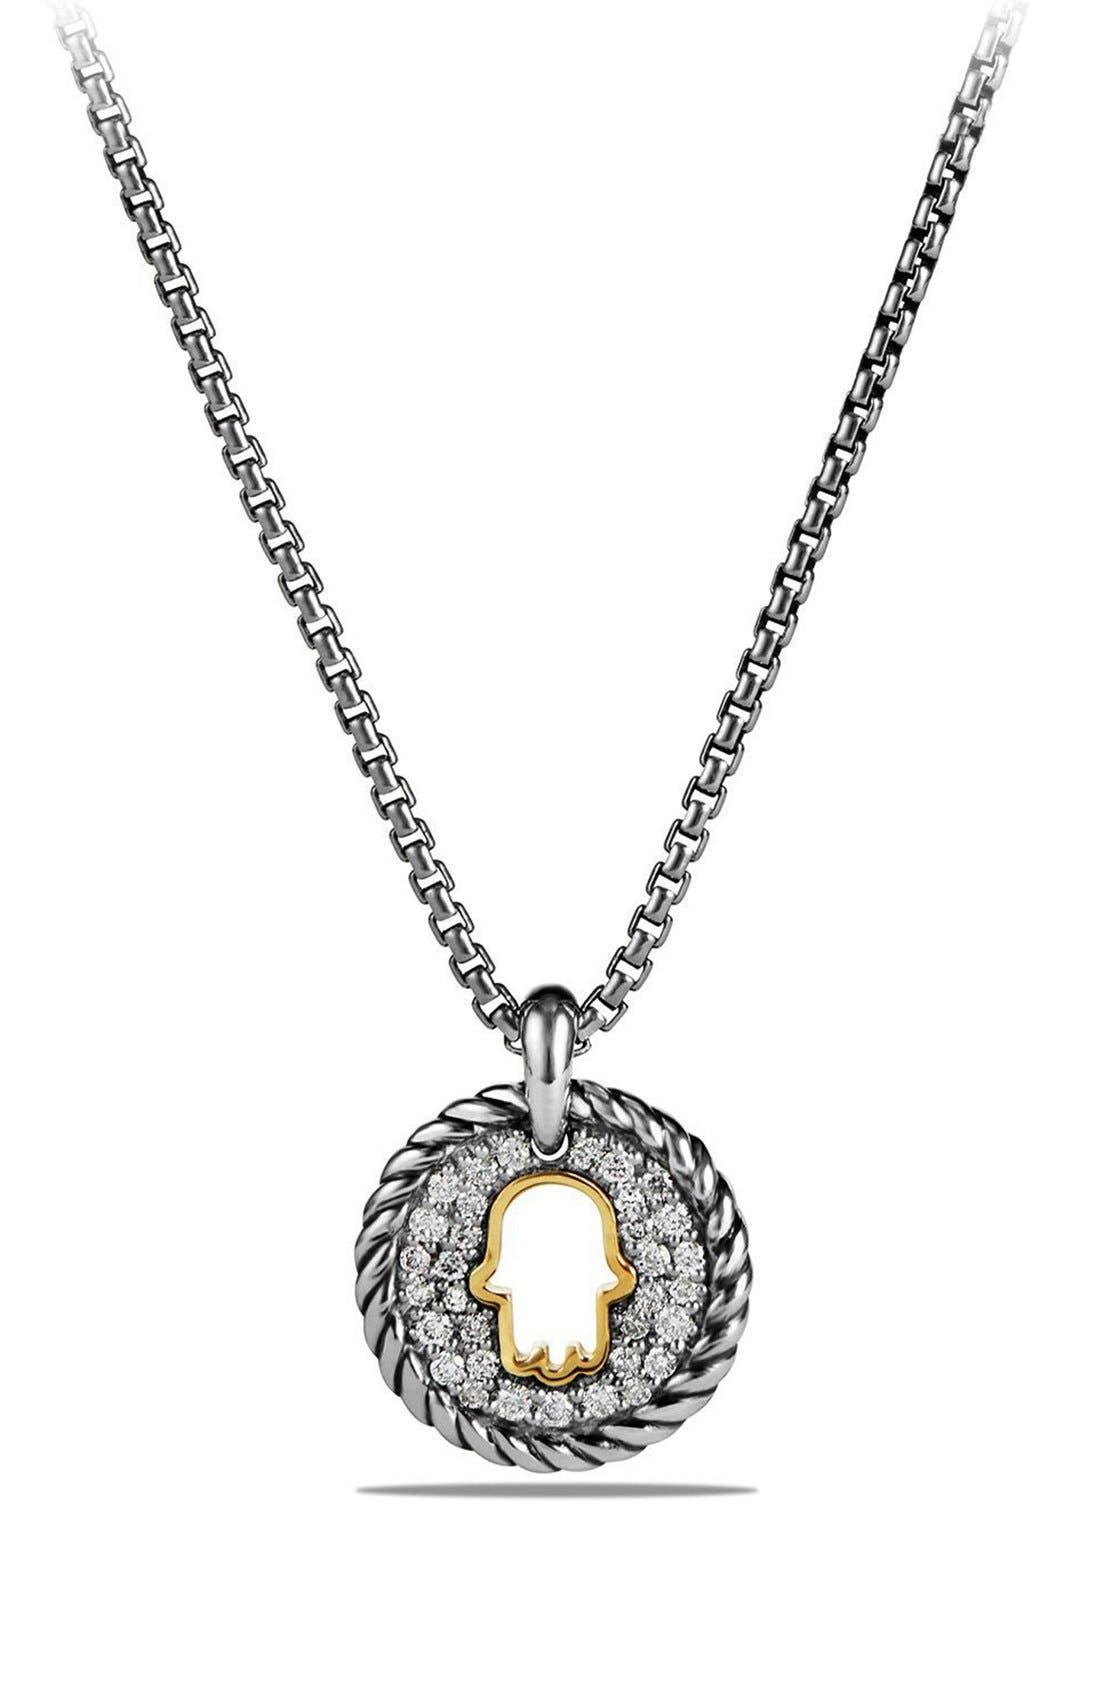 David Yurman 'Cable Collectibles' Hamsa Charm Necklace with Diamonds & 18K Gold